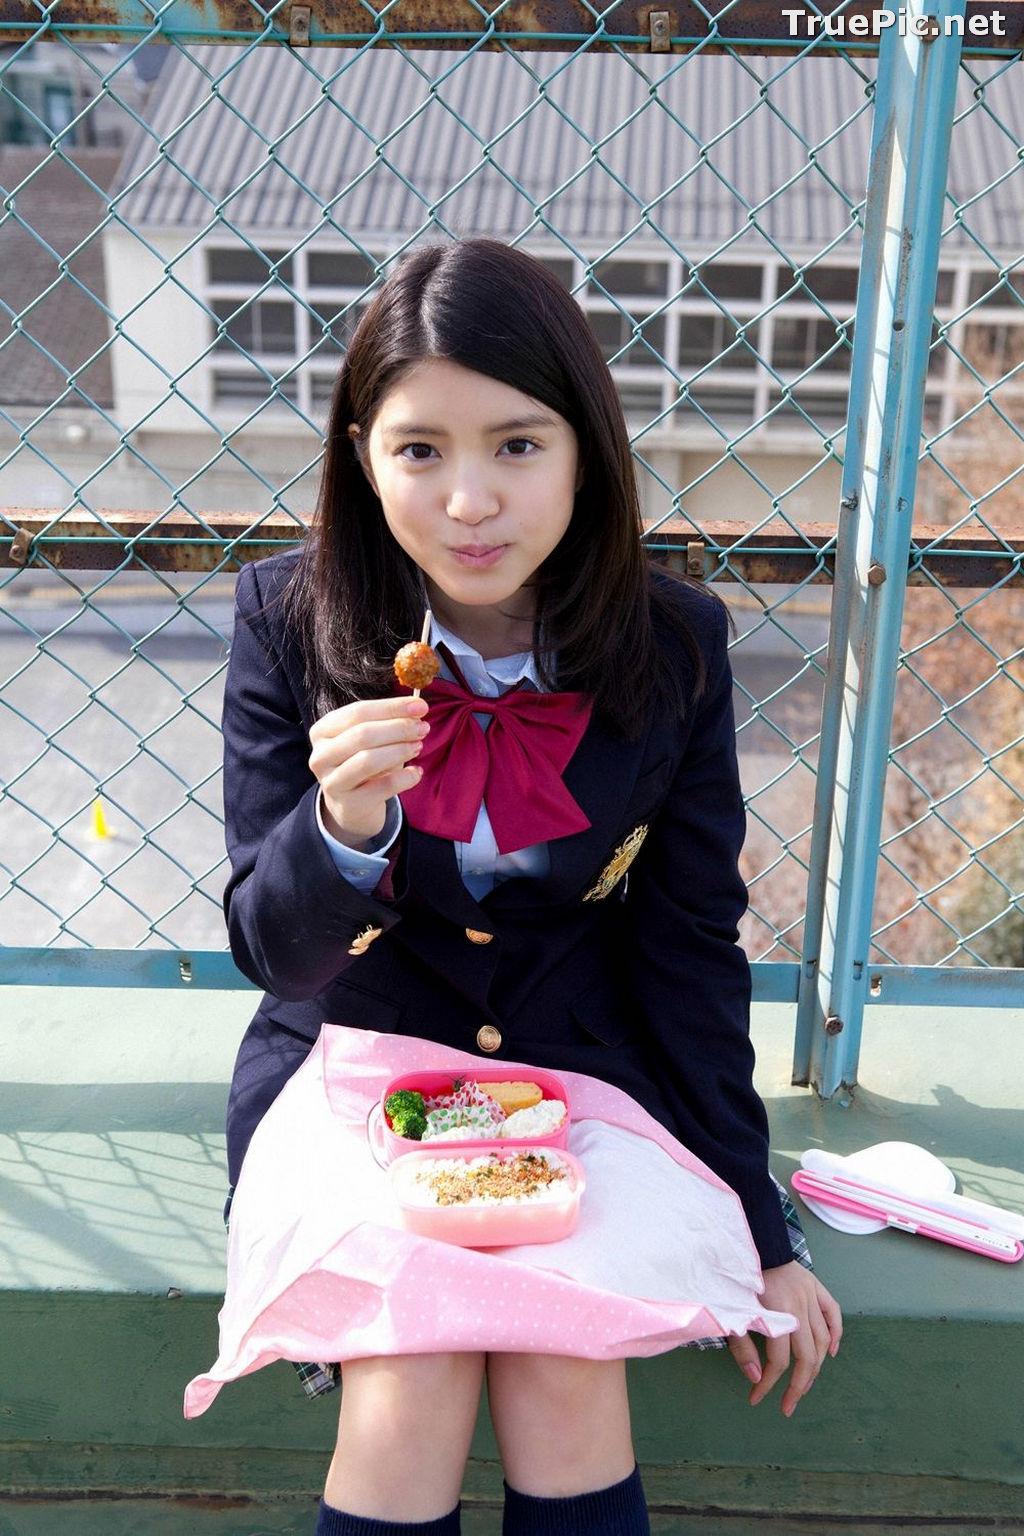 Image [YS Web] Vol.506 - Japanese Actress and Singer - Umika Kawashima - TruePic.net - Picture-2